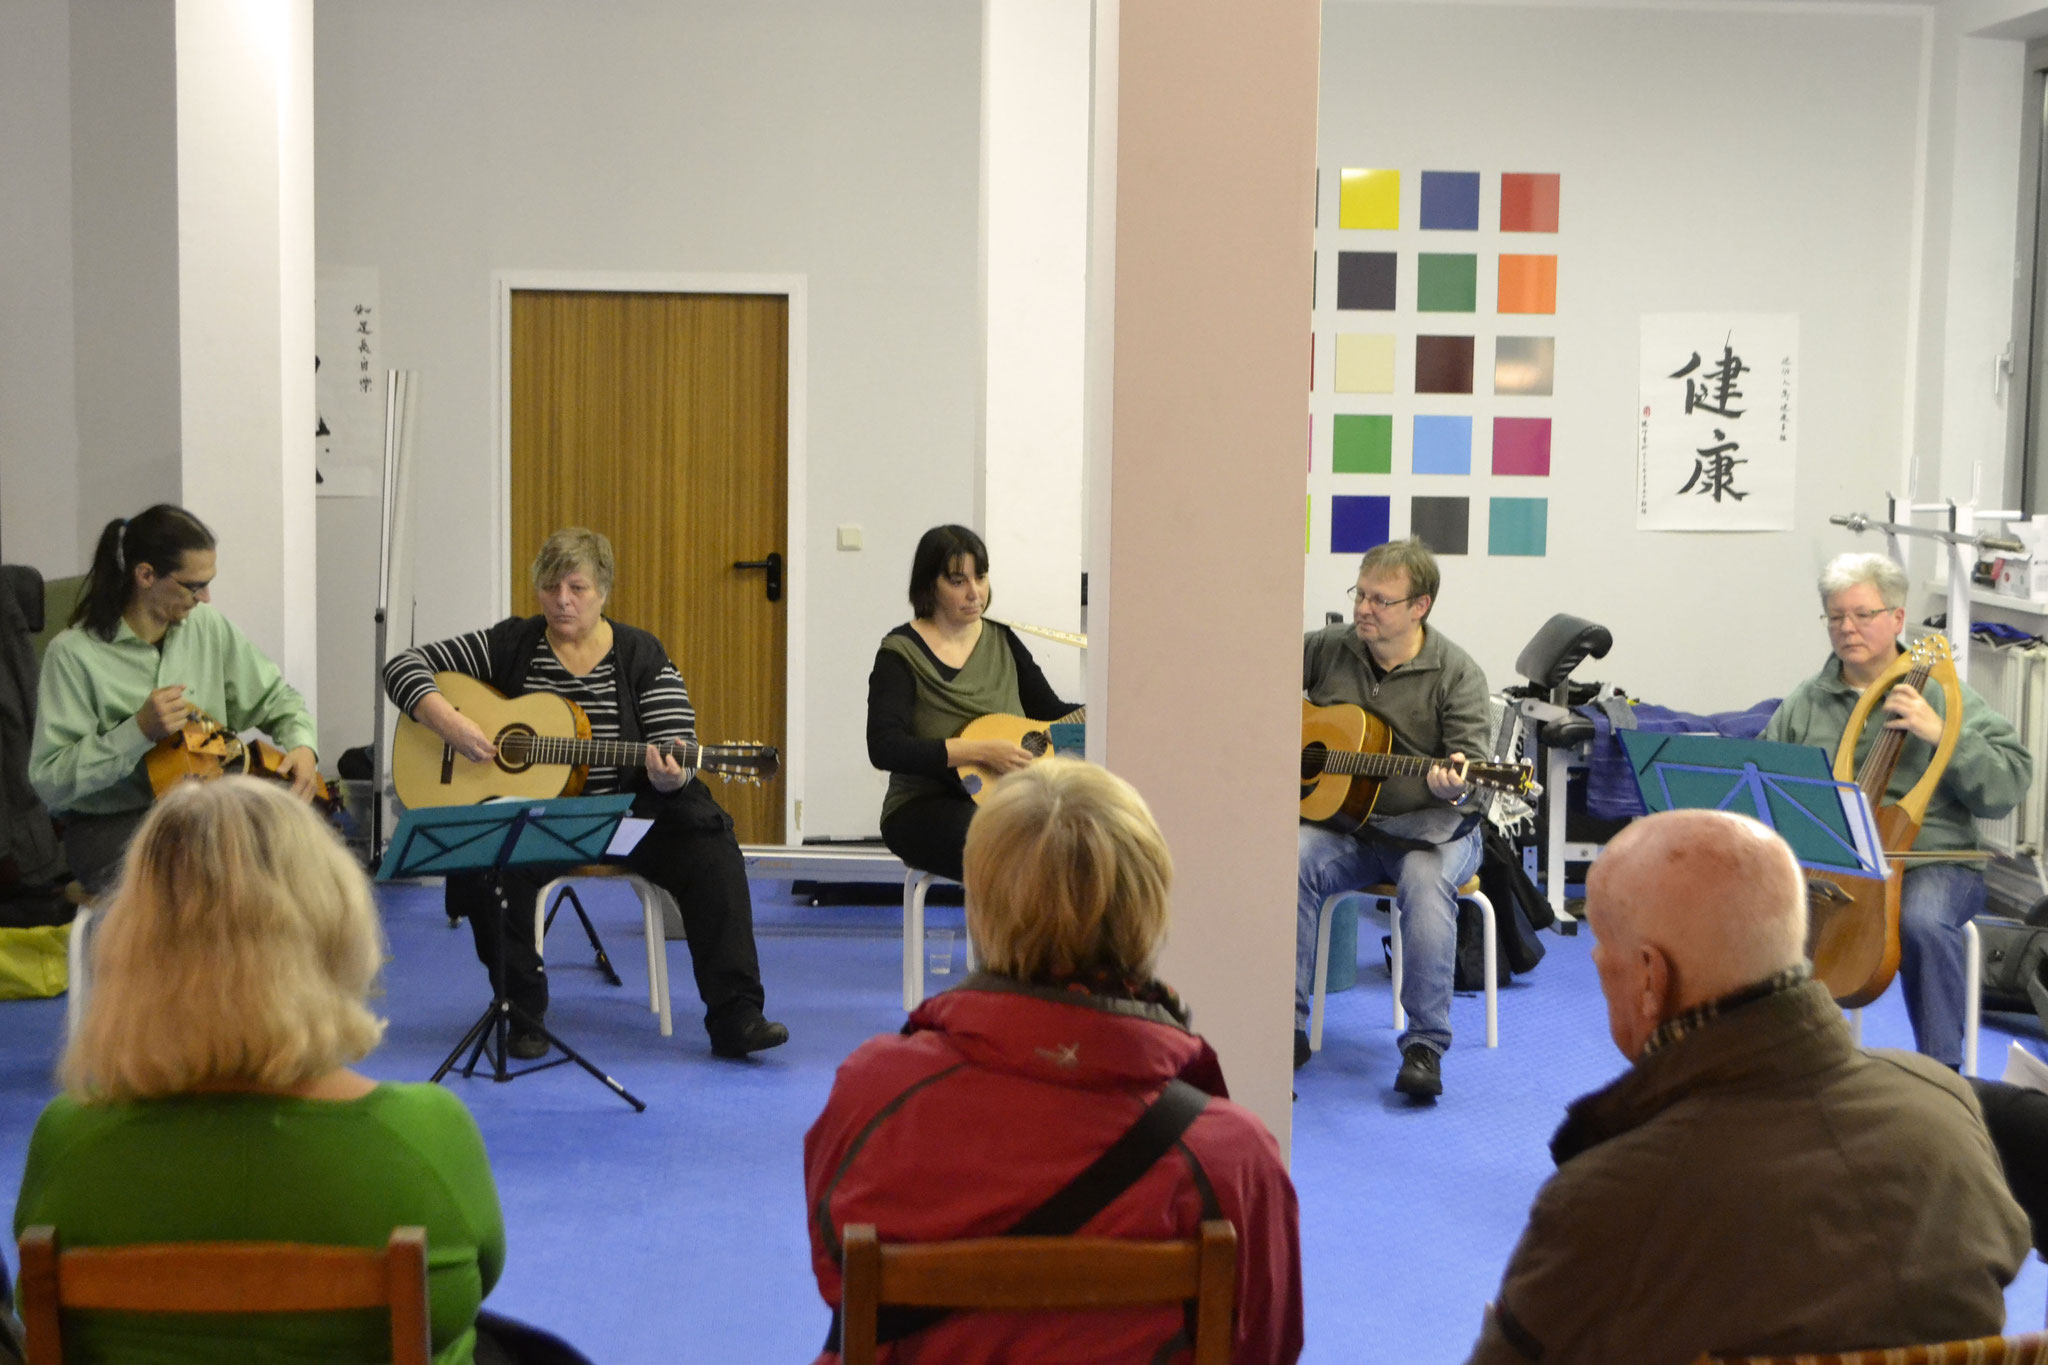 FreitagsMusiker im TAO Gesundheitszentrum, Foto: Florina Limberg